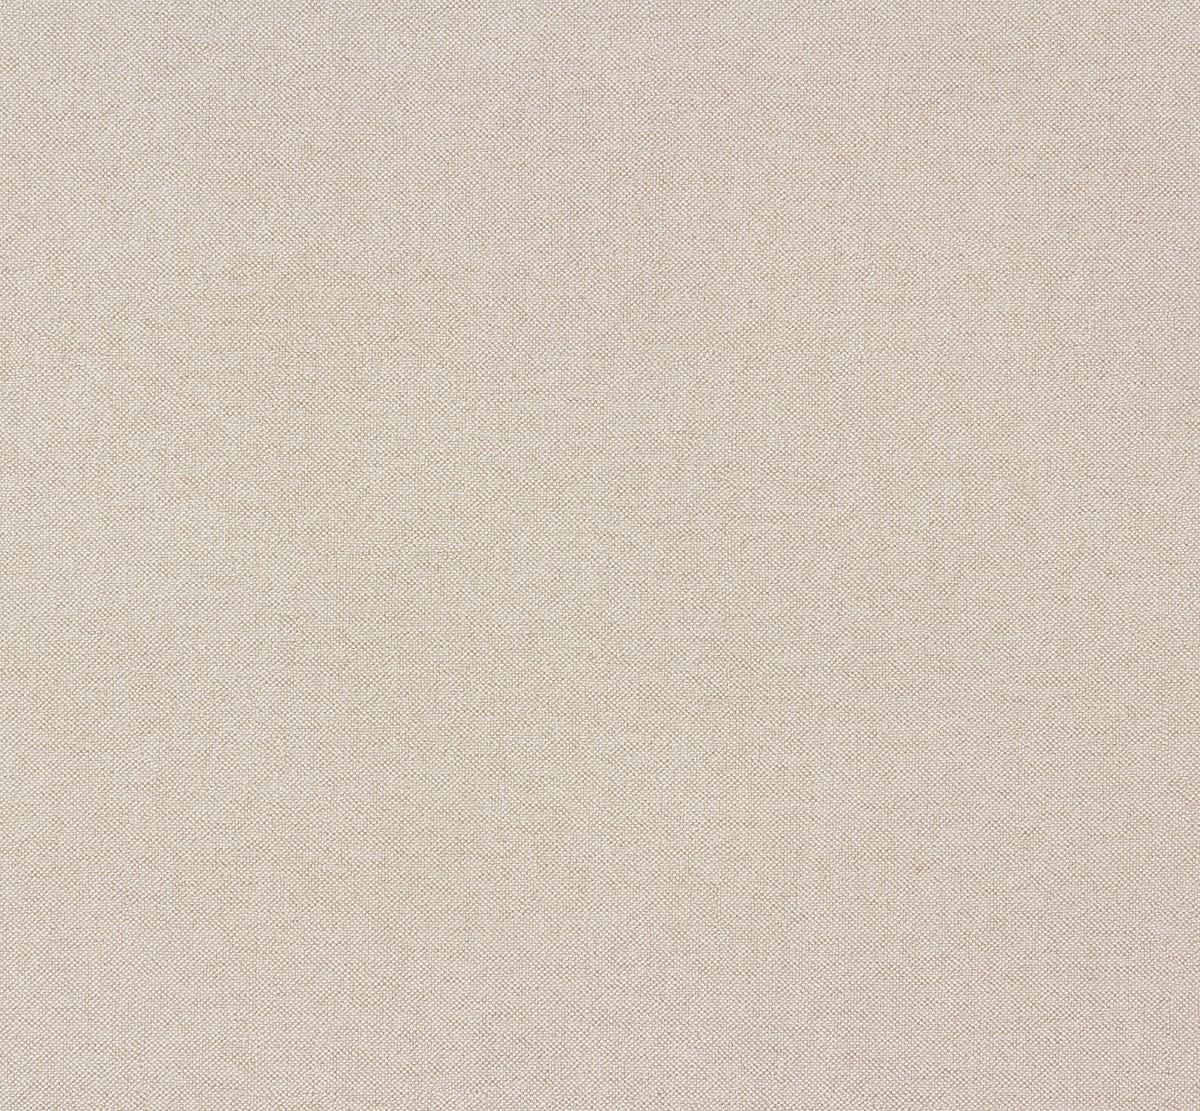 tapete einfarbig grau as creation elegance 30486 2. Black Bedroom Furniture Sets. Home Design Ideas